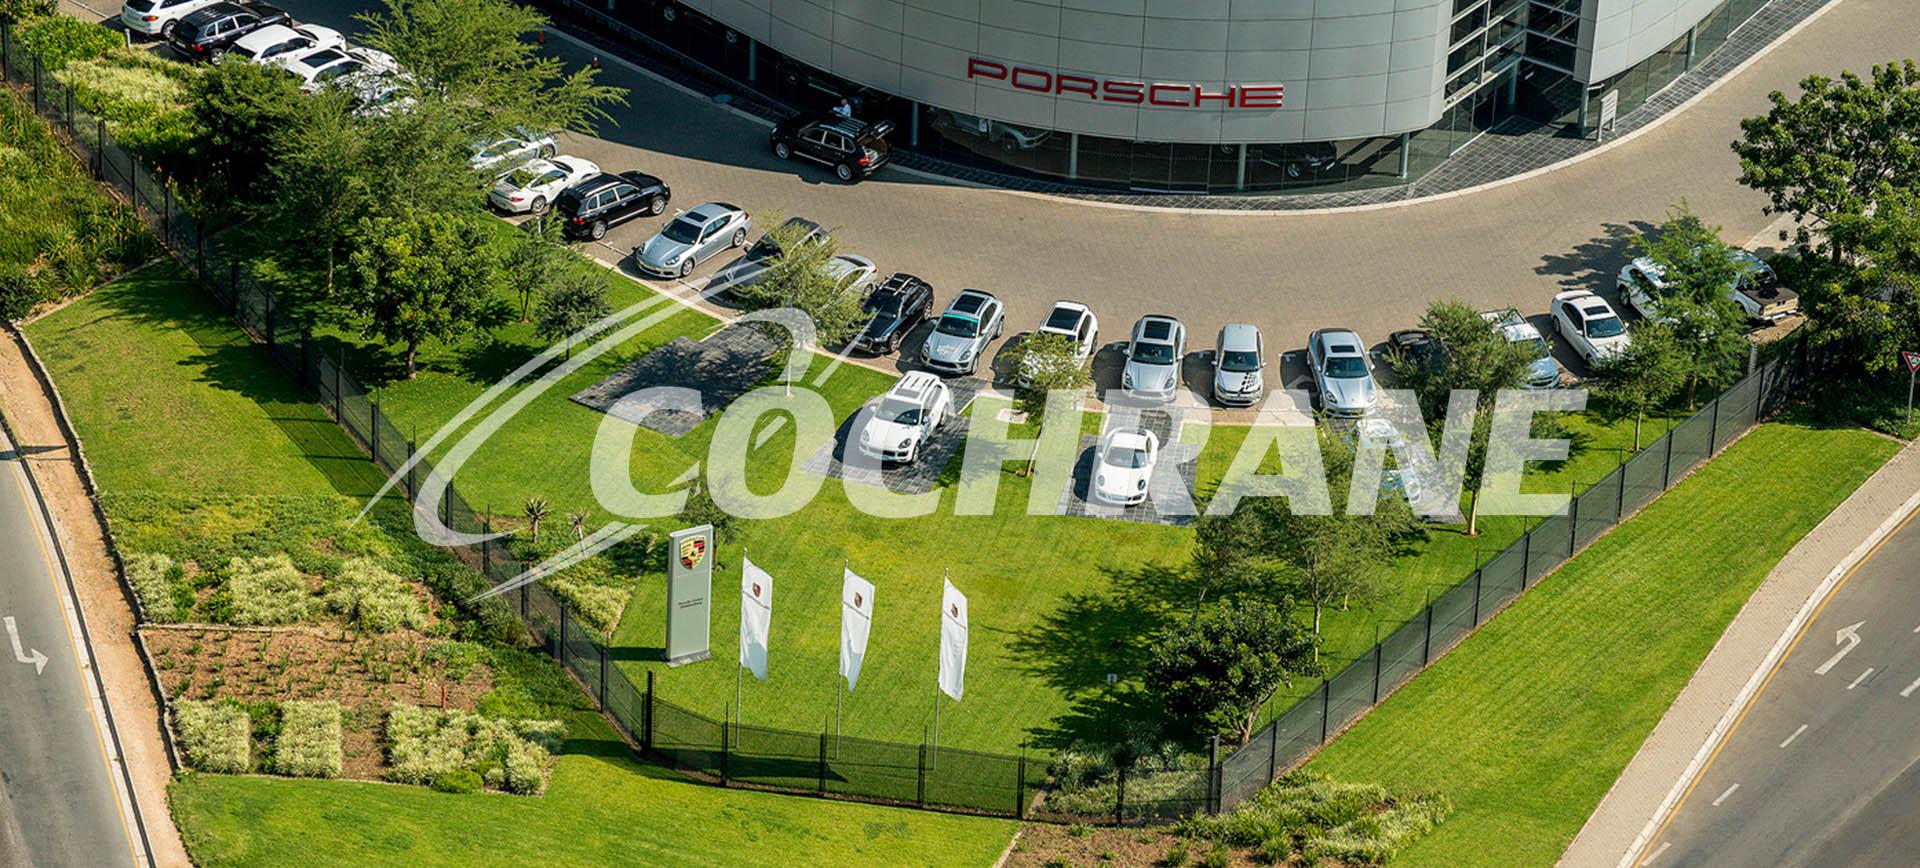 4_Porsche-Aerial